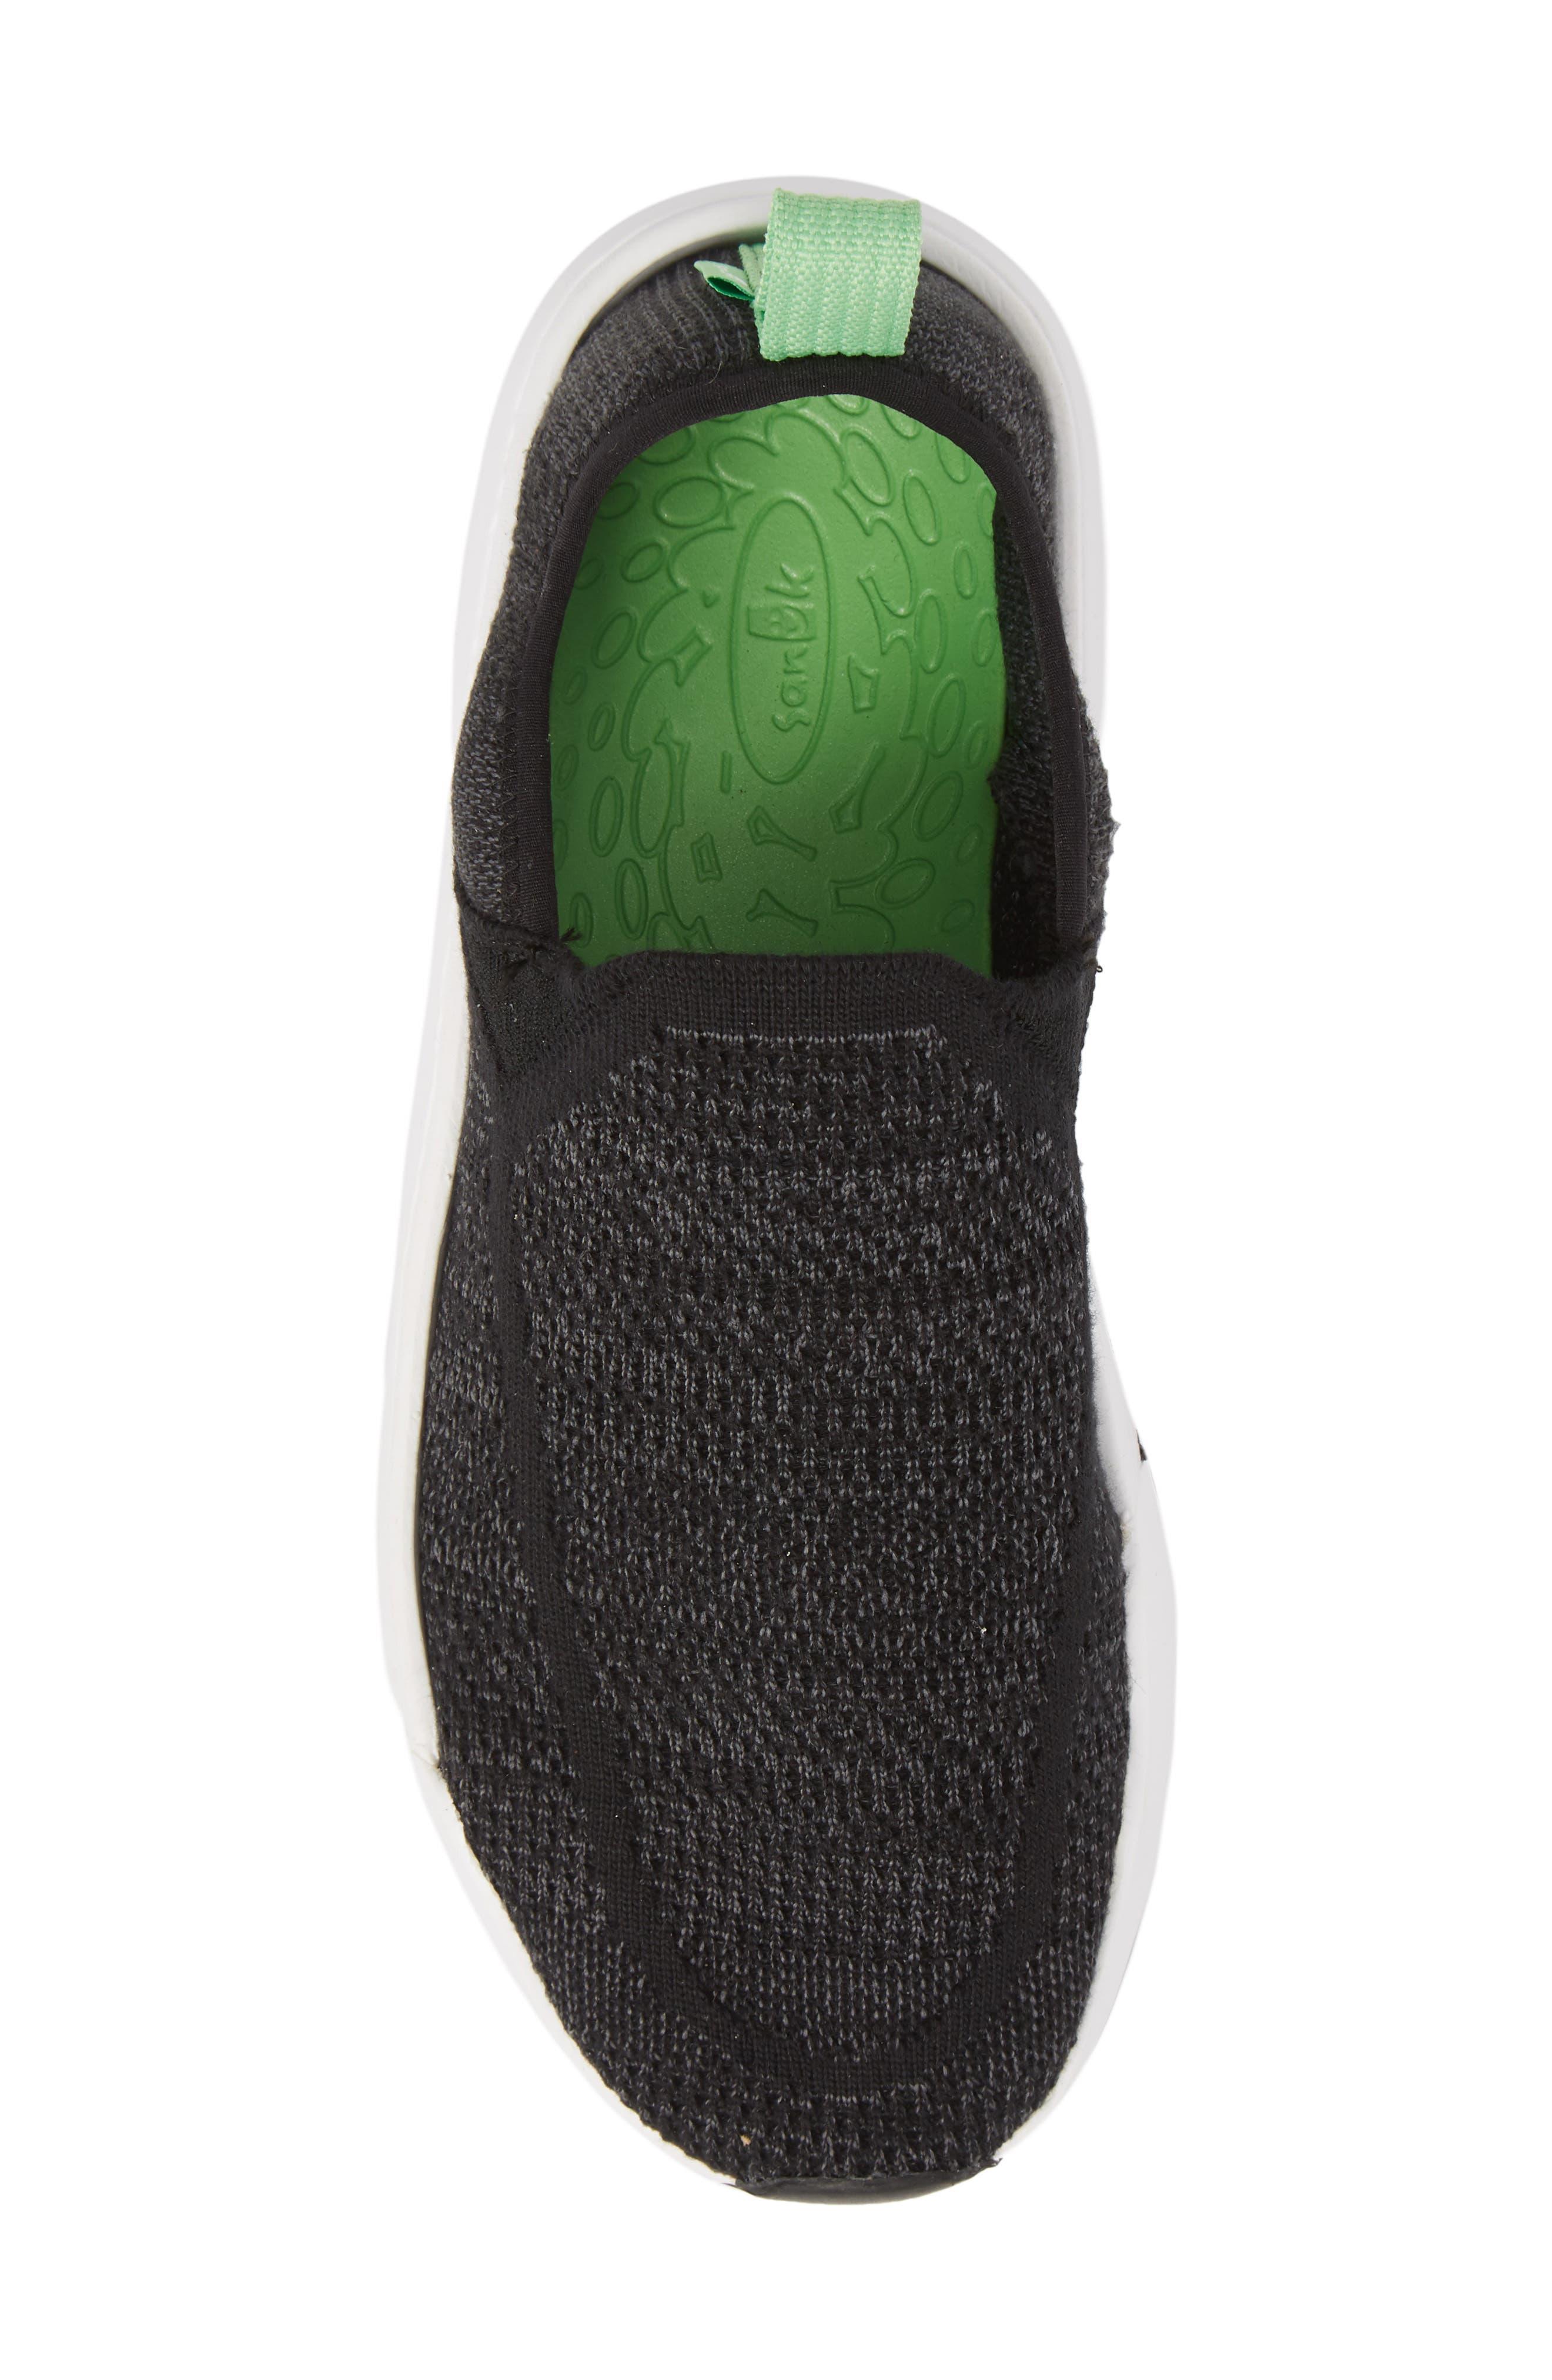 SANUK, Chiba Quest Knit Slip-On Sneaker, Alternate thumbnail 5, color, BLACK